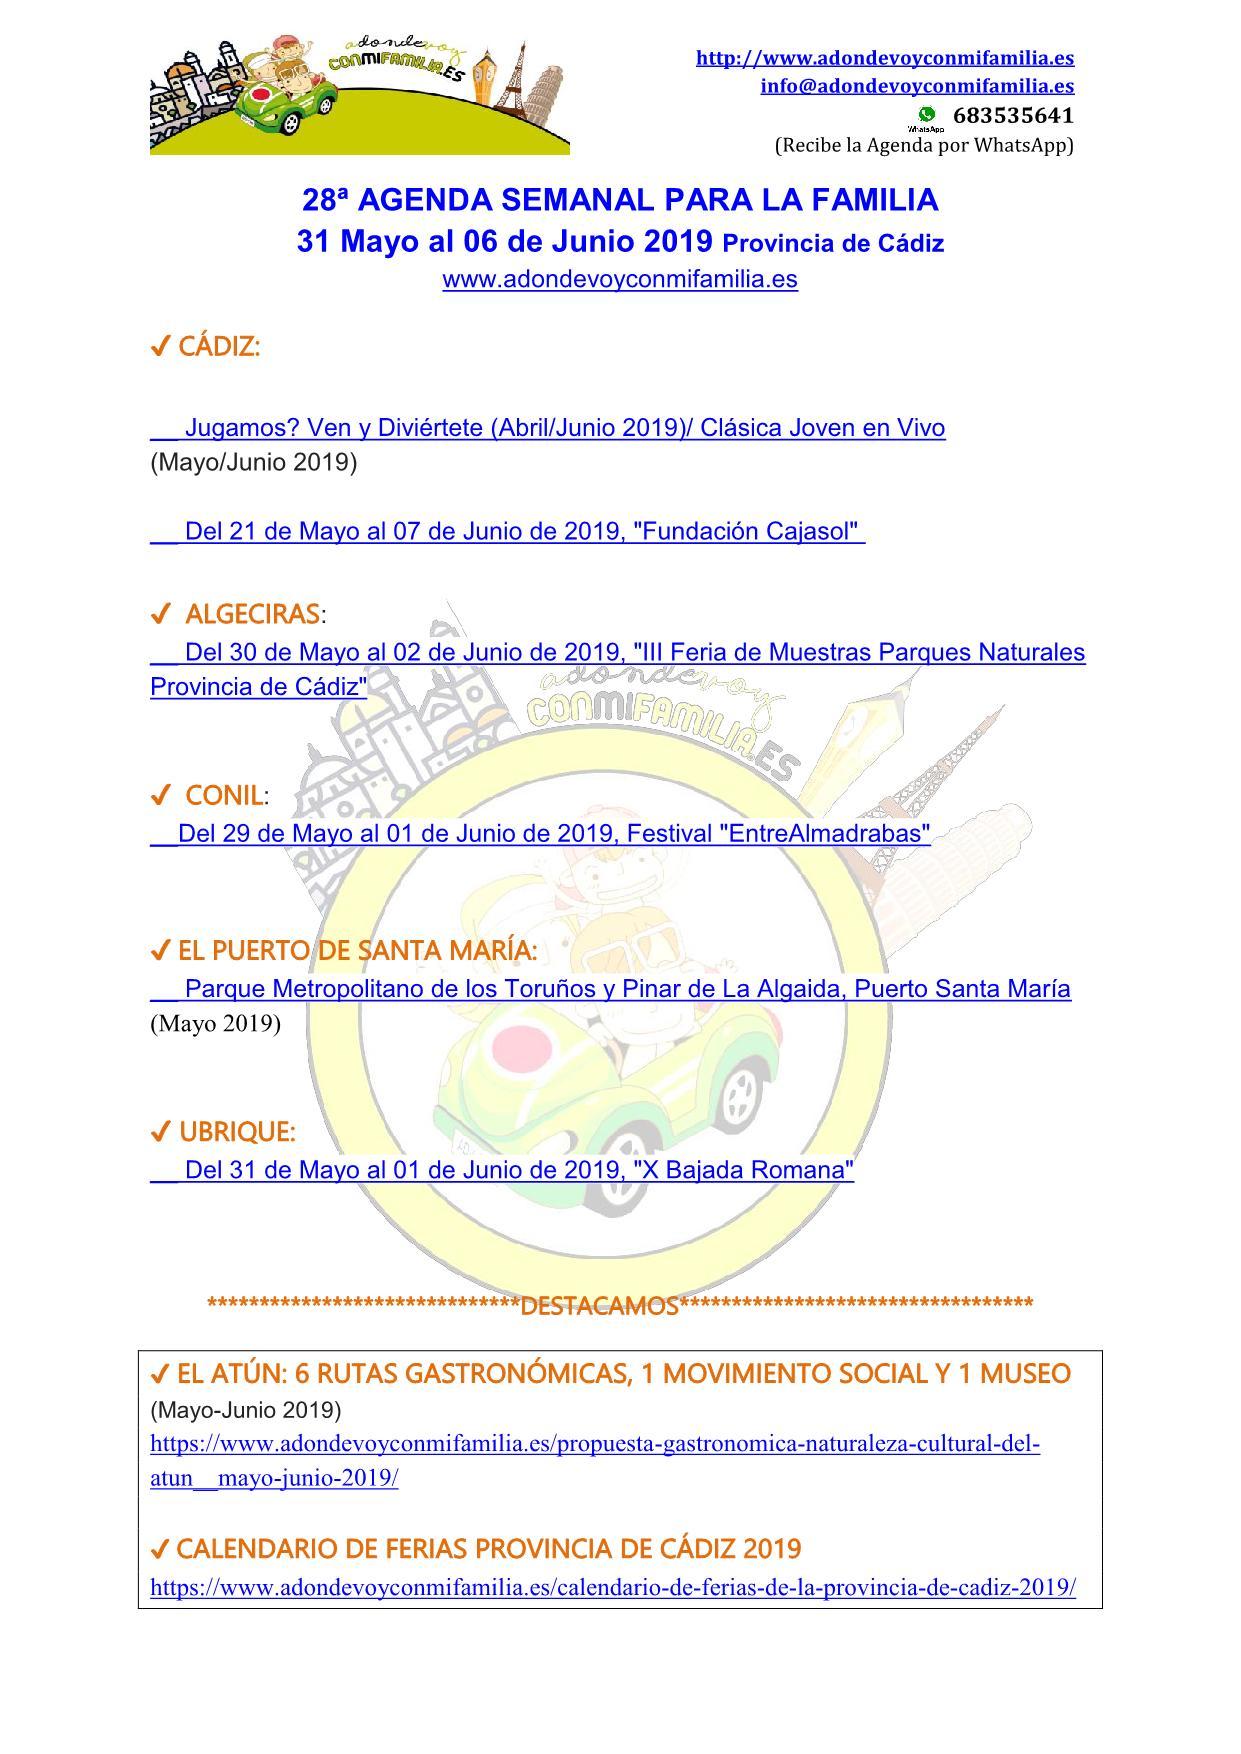 Agenda semanal familiar 31 Mayo al 06 Junio 2019